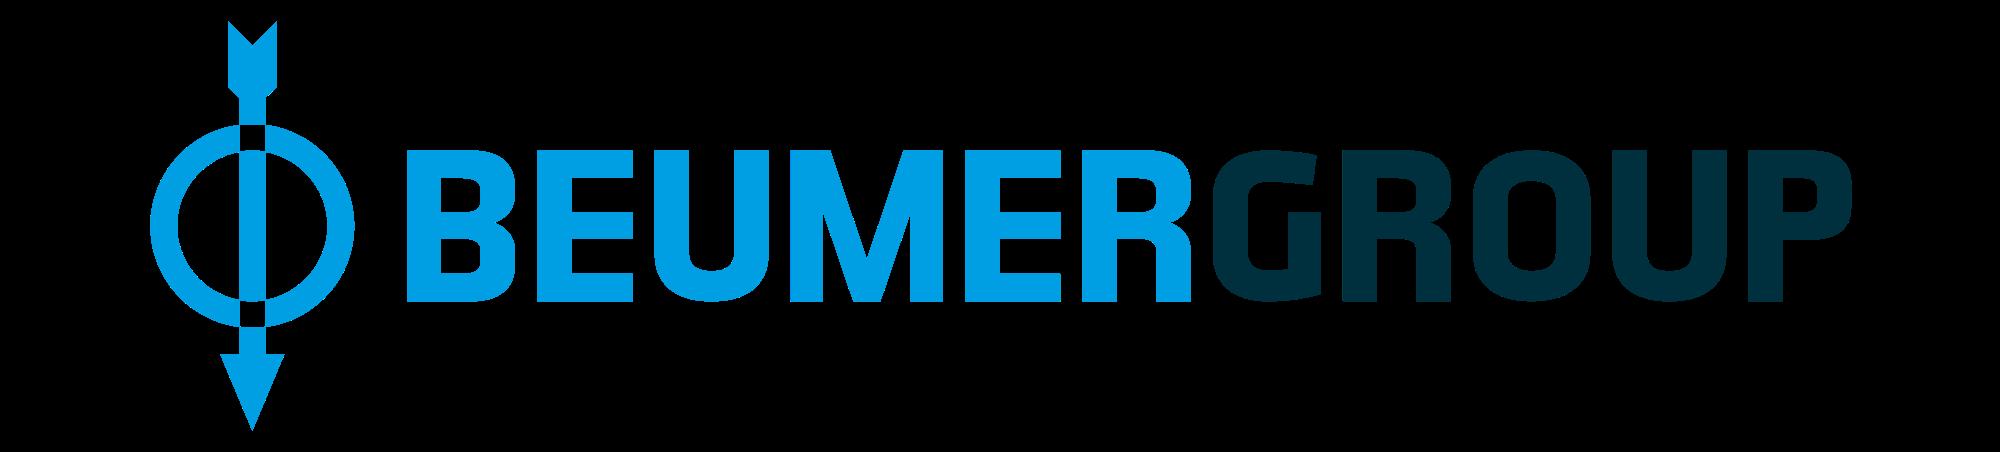 Beumer_Group_Logo